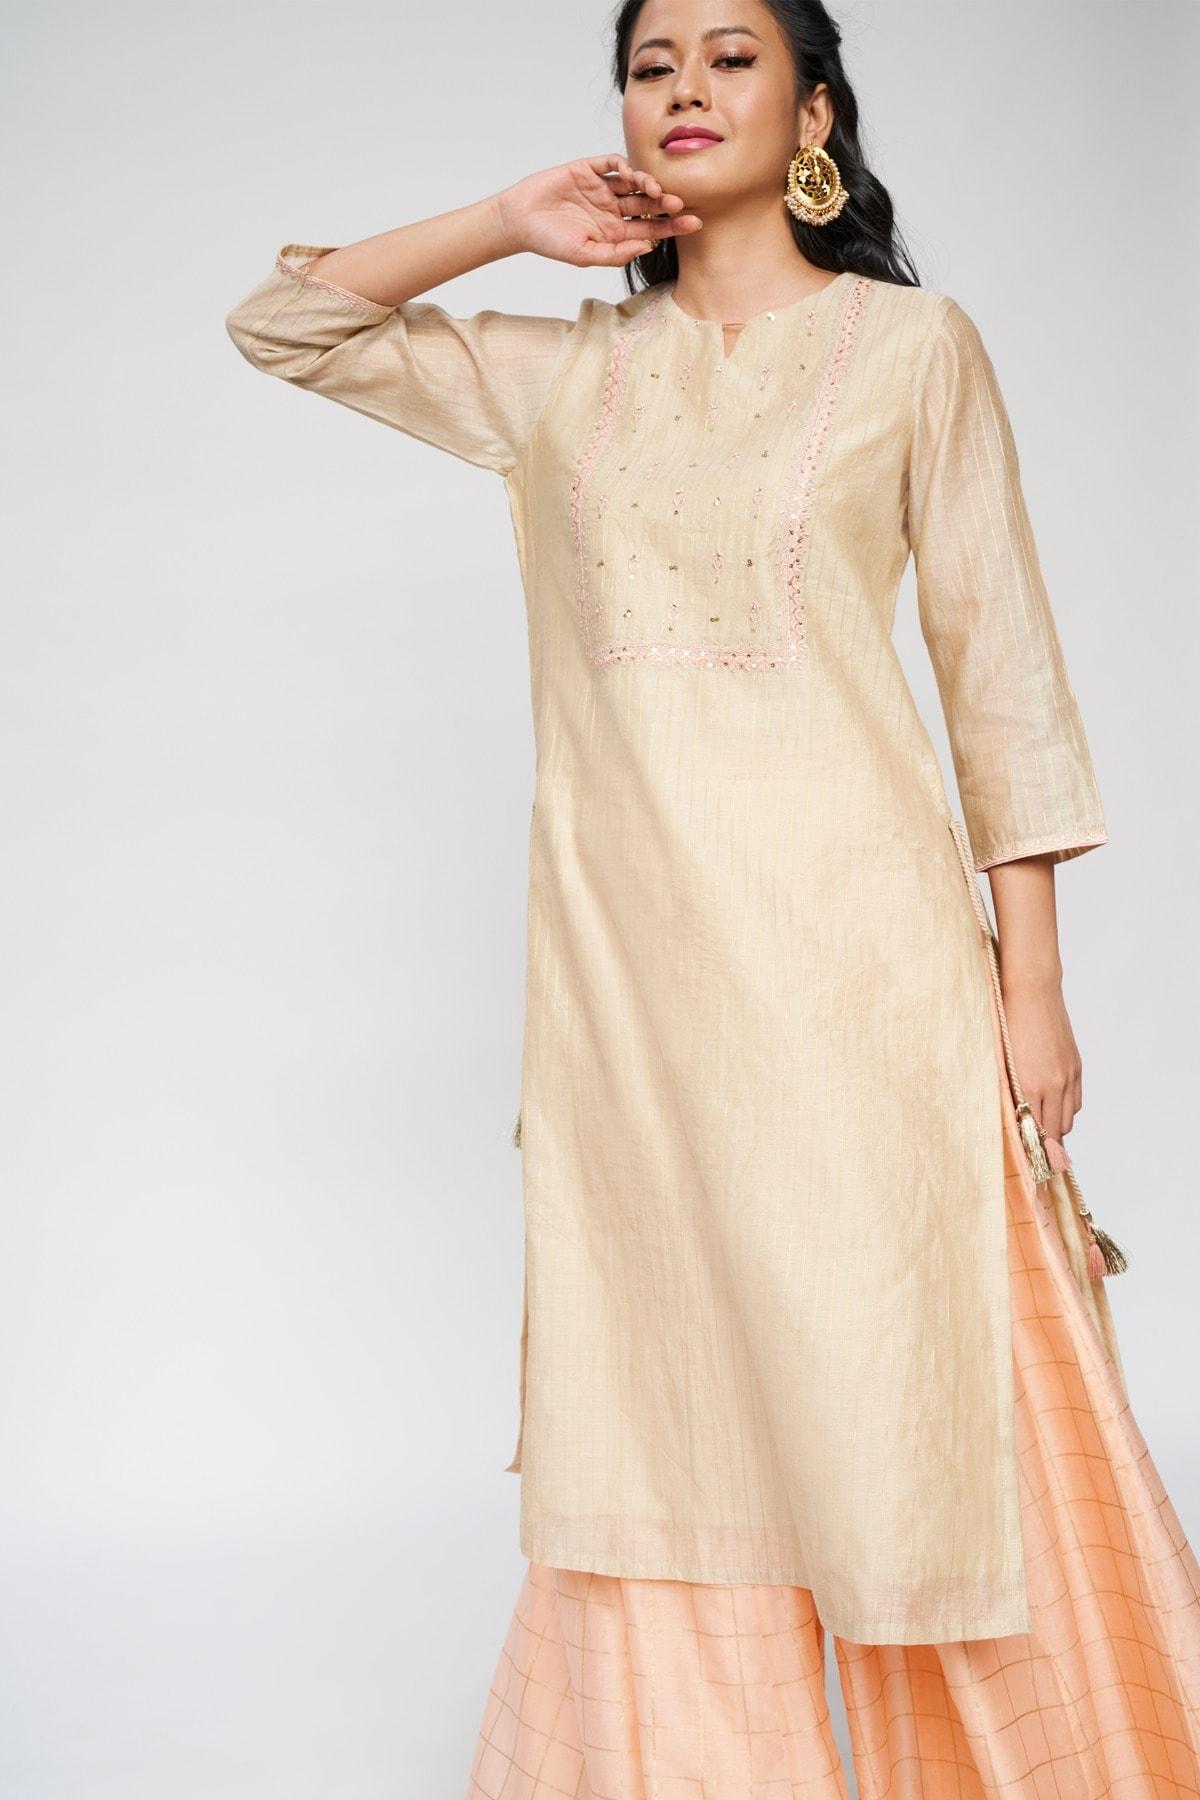 Global Desi | Beige Self Design Embroidered A-Line Suit